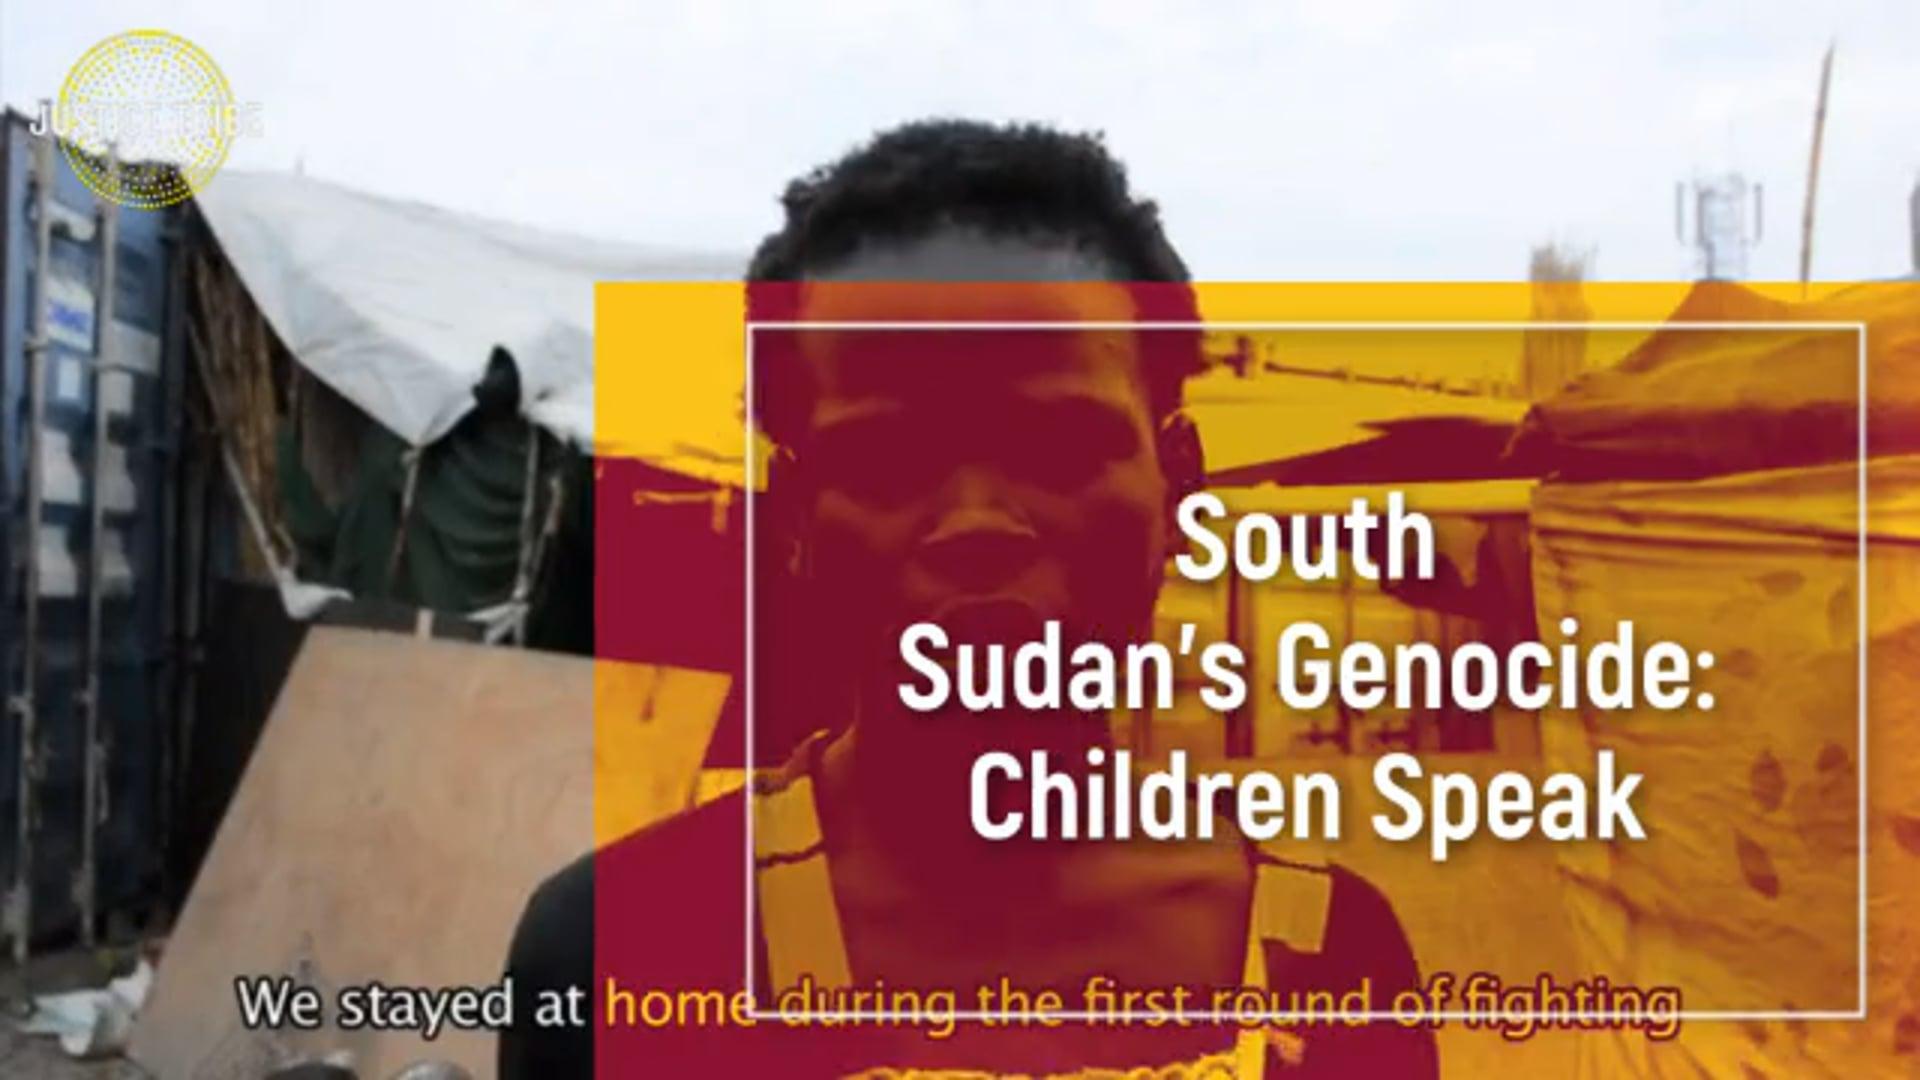 South Sudan's Genocide: Children Speak